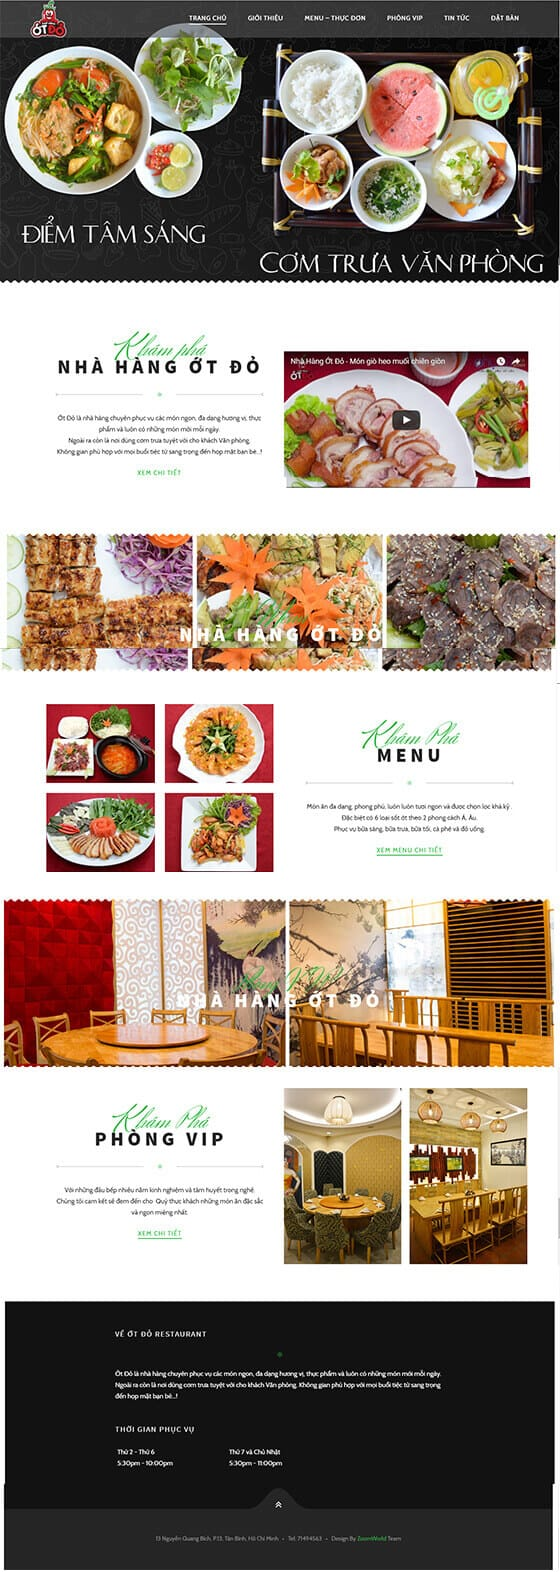 Mẫu website nhà hàng 01